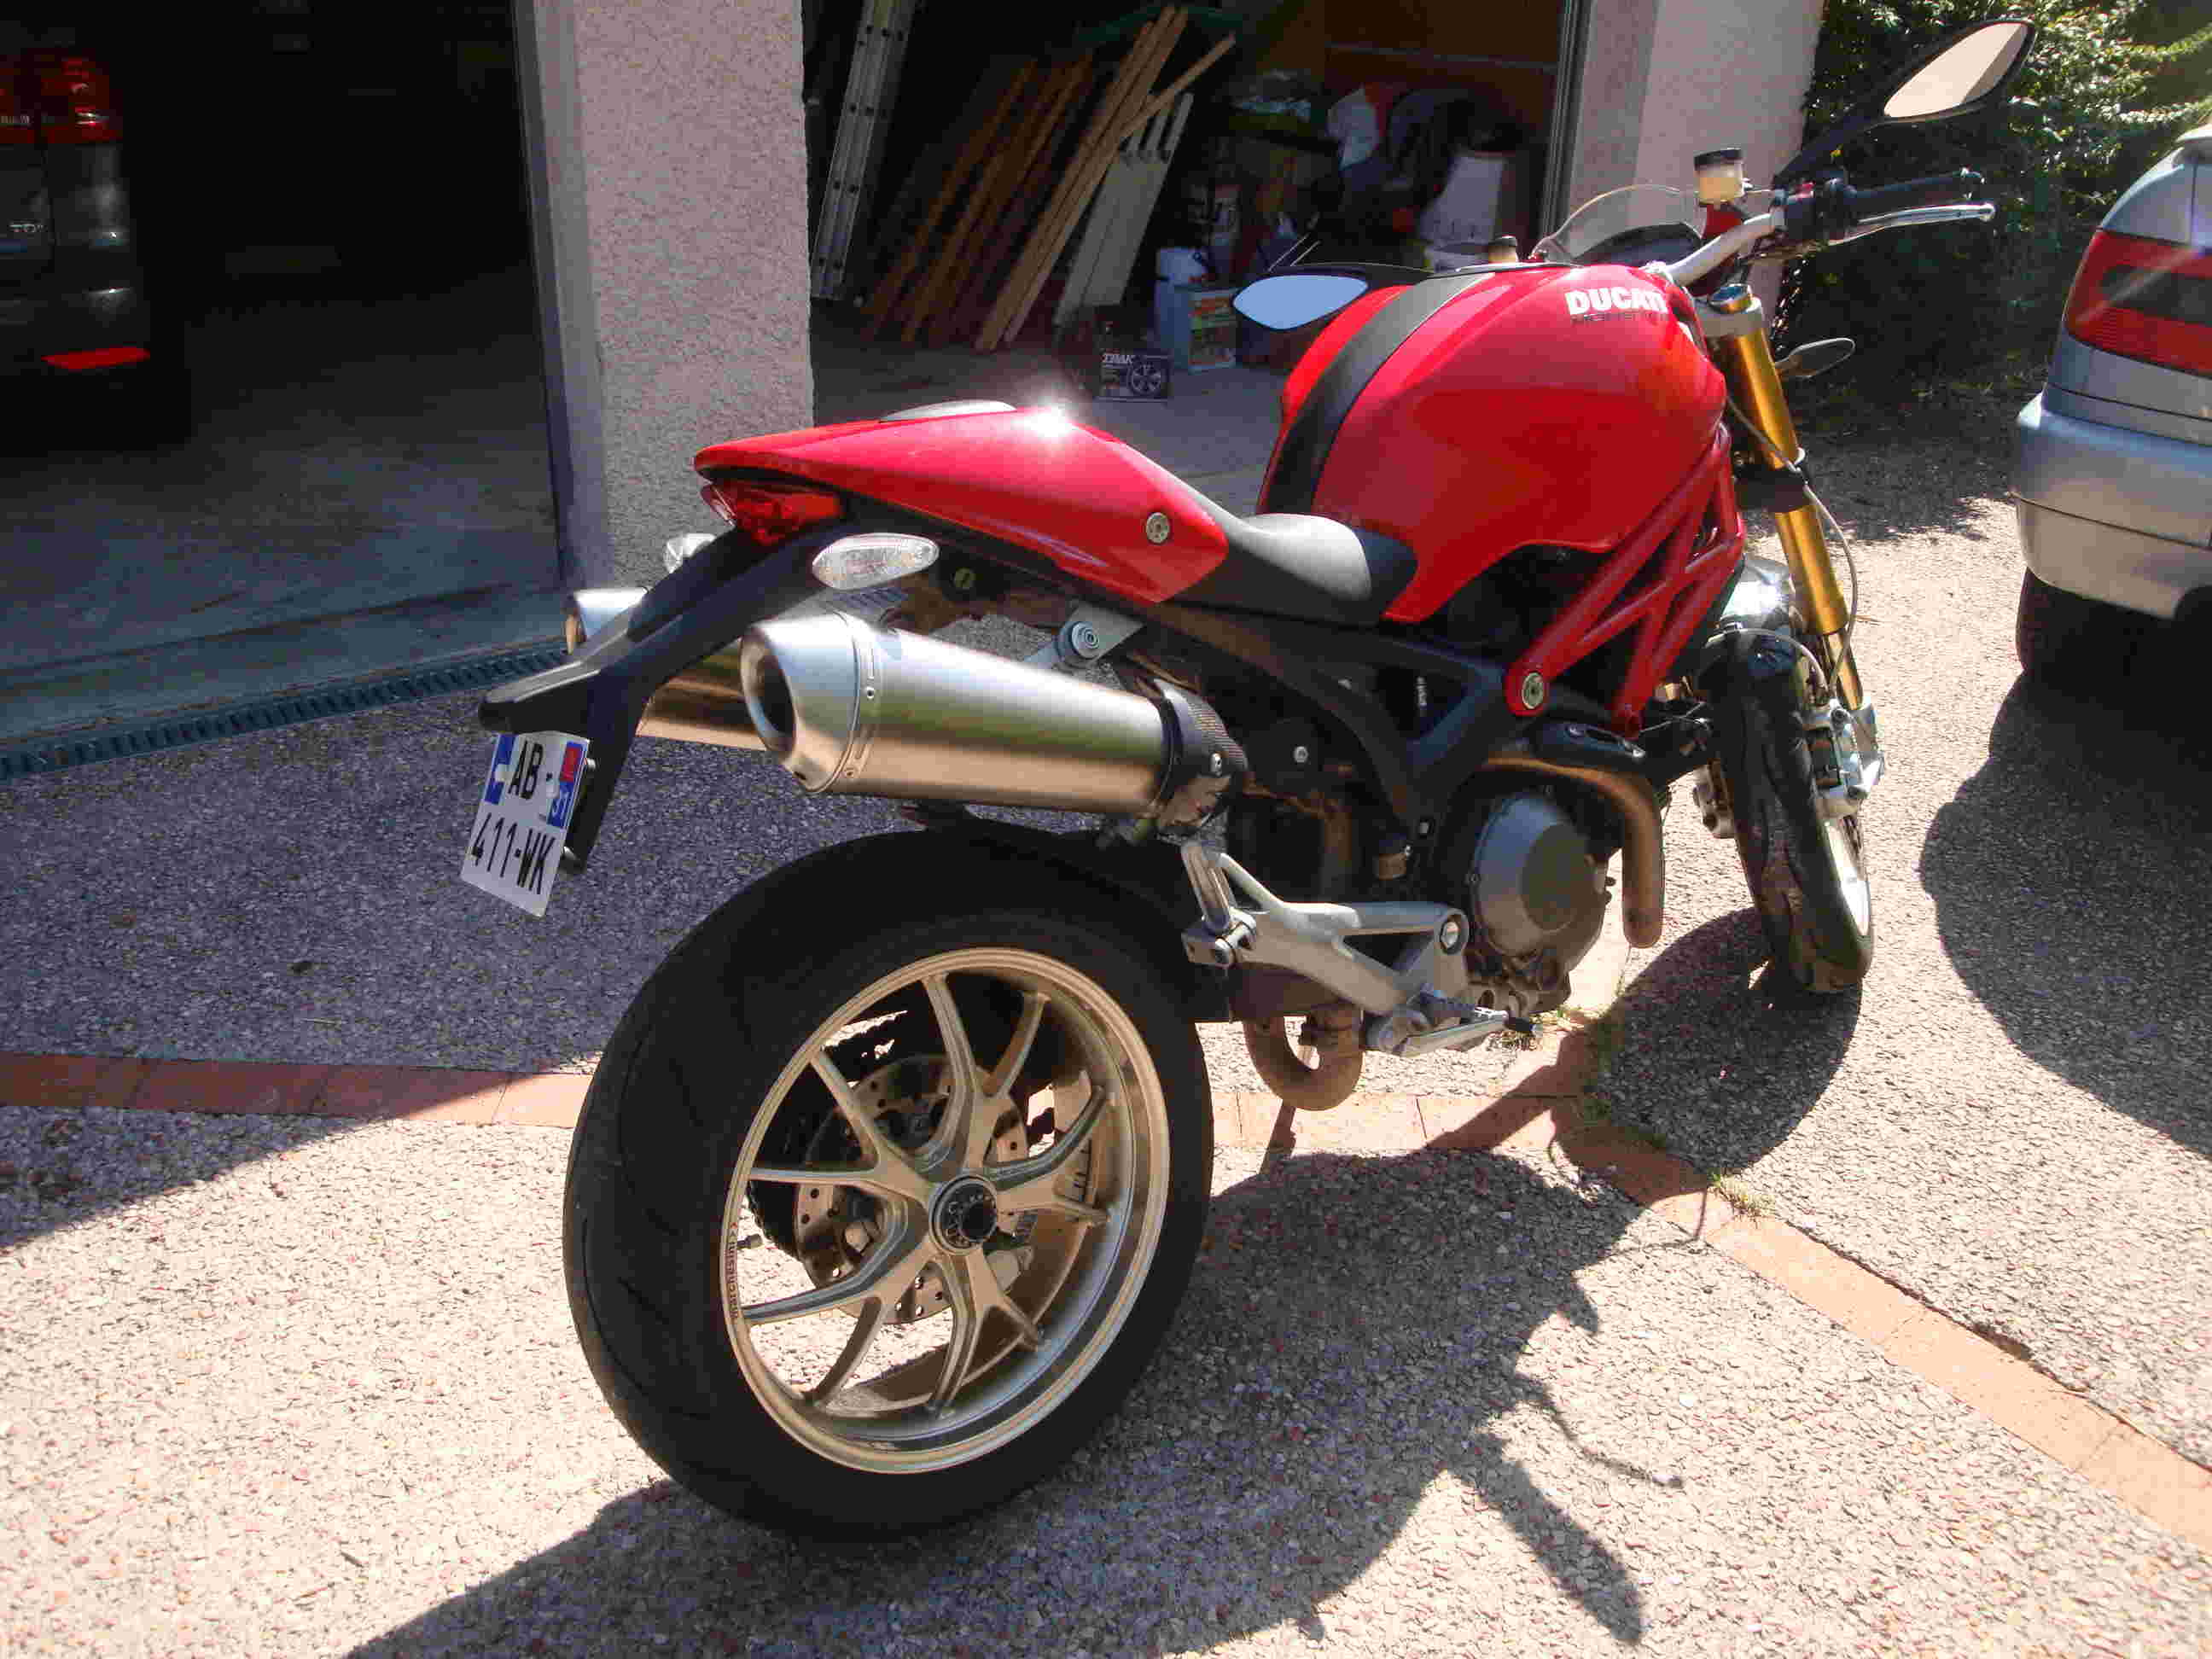 Monster 1100 S Termignoni Titane Dsc06912